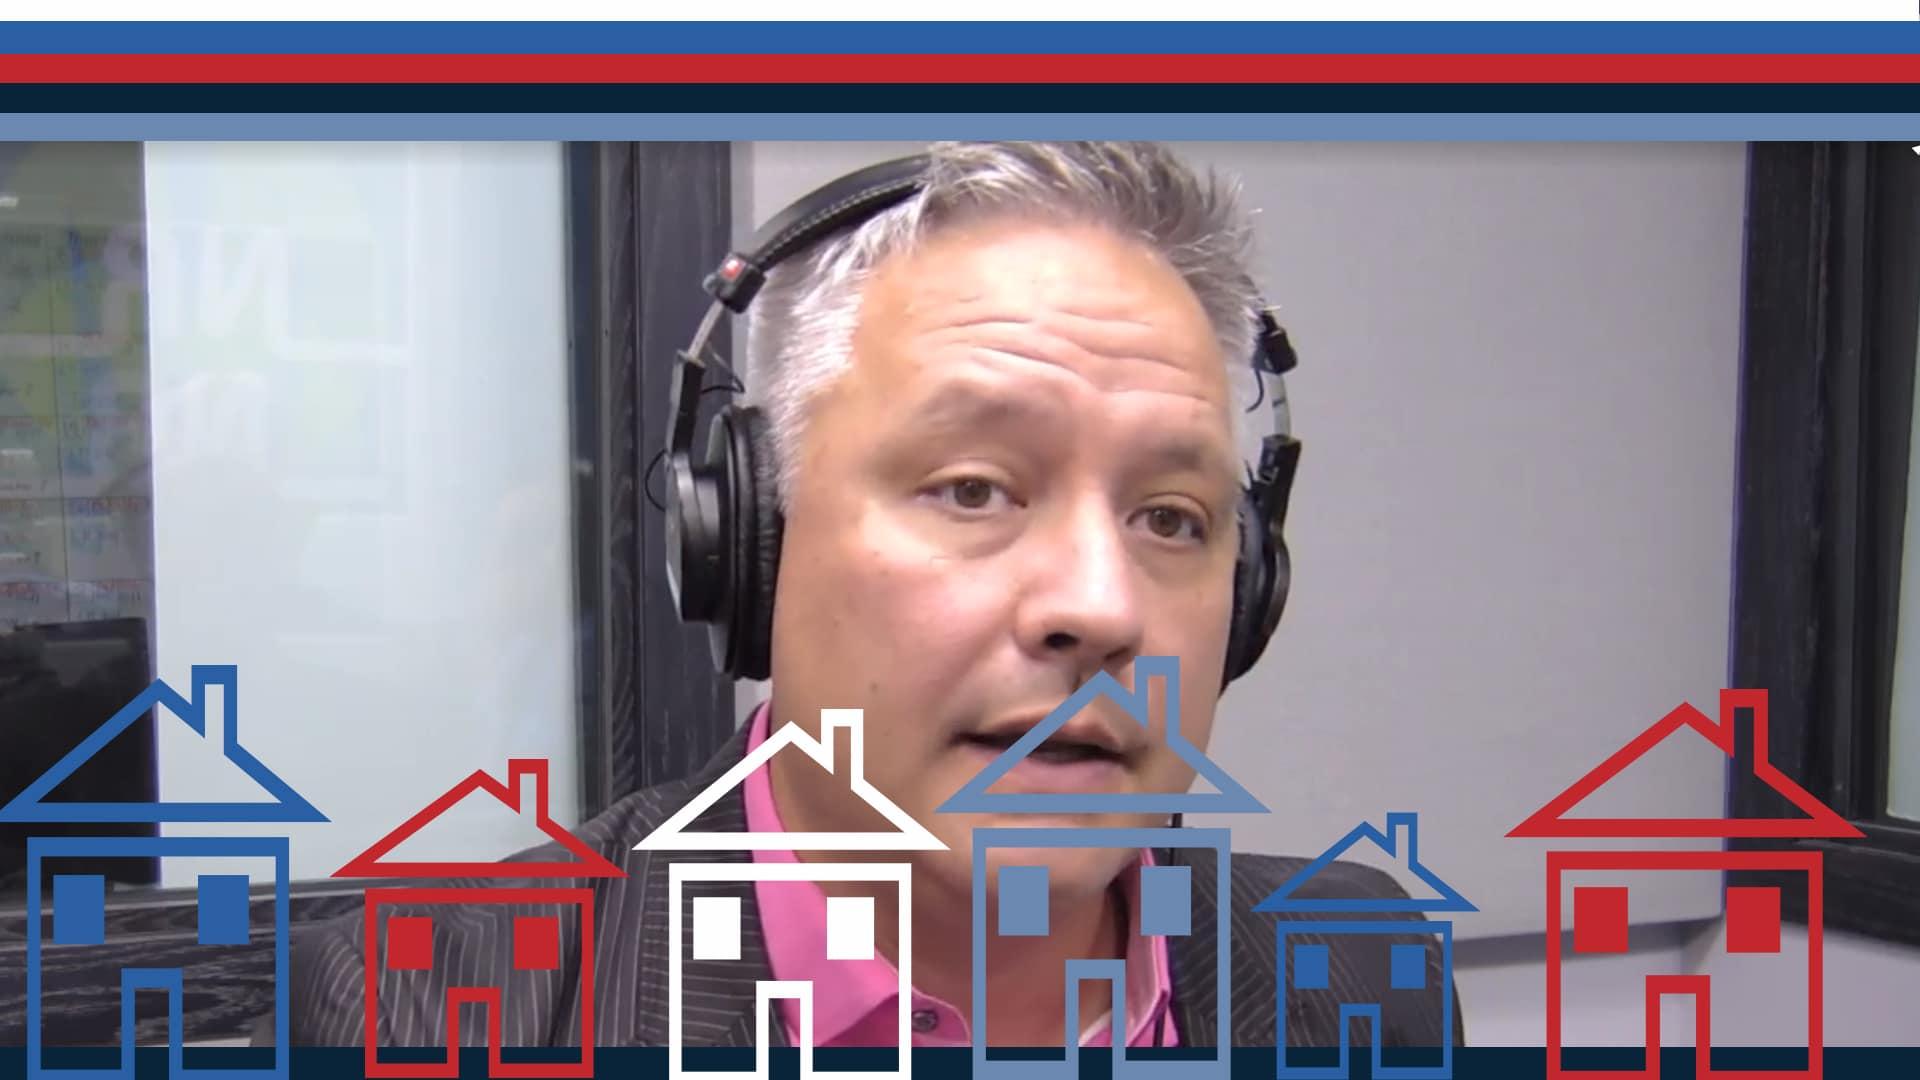 Real Estate Realities - Episode 9